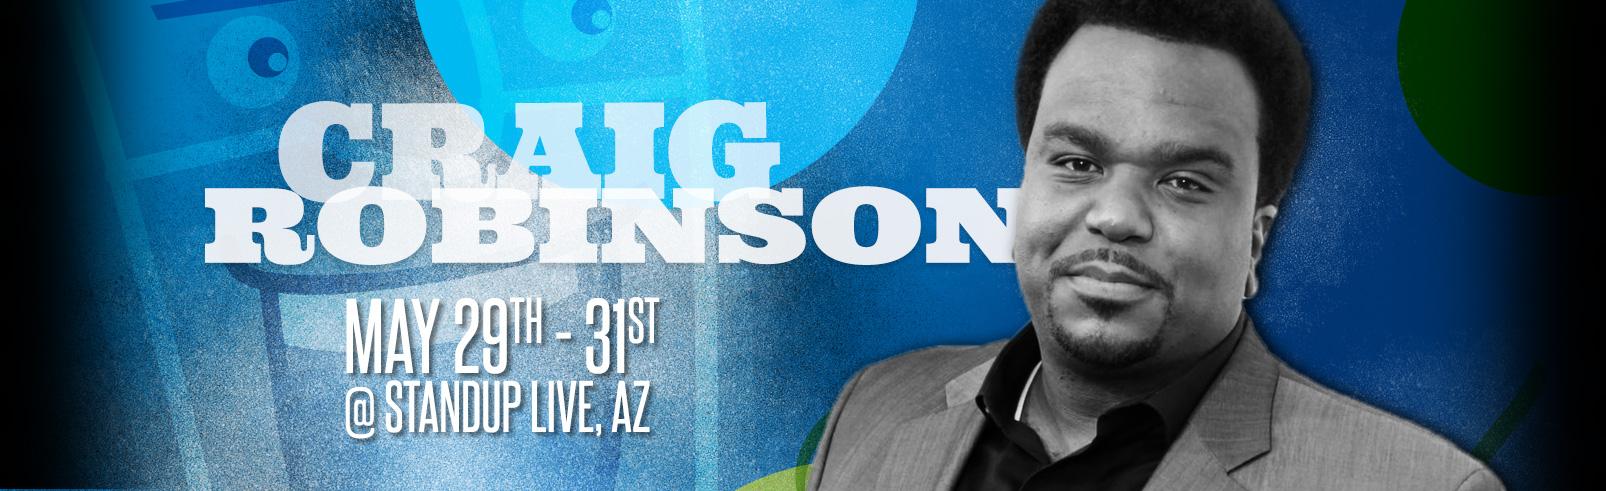 Craig Robinson @ StandUp Live